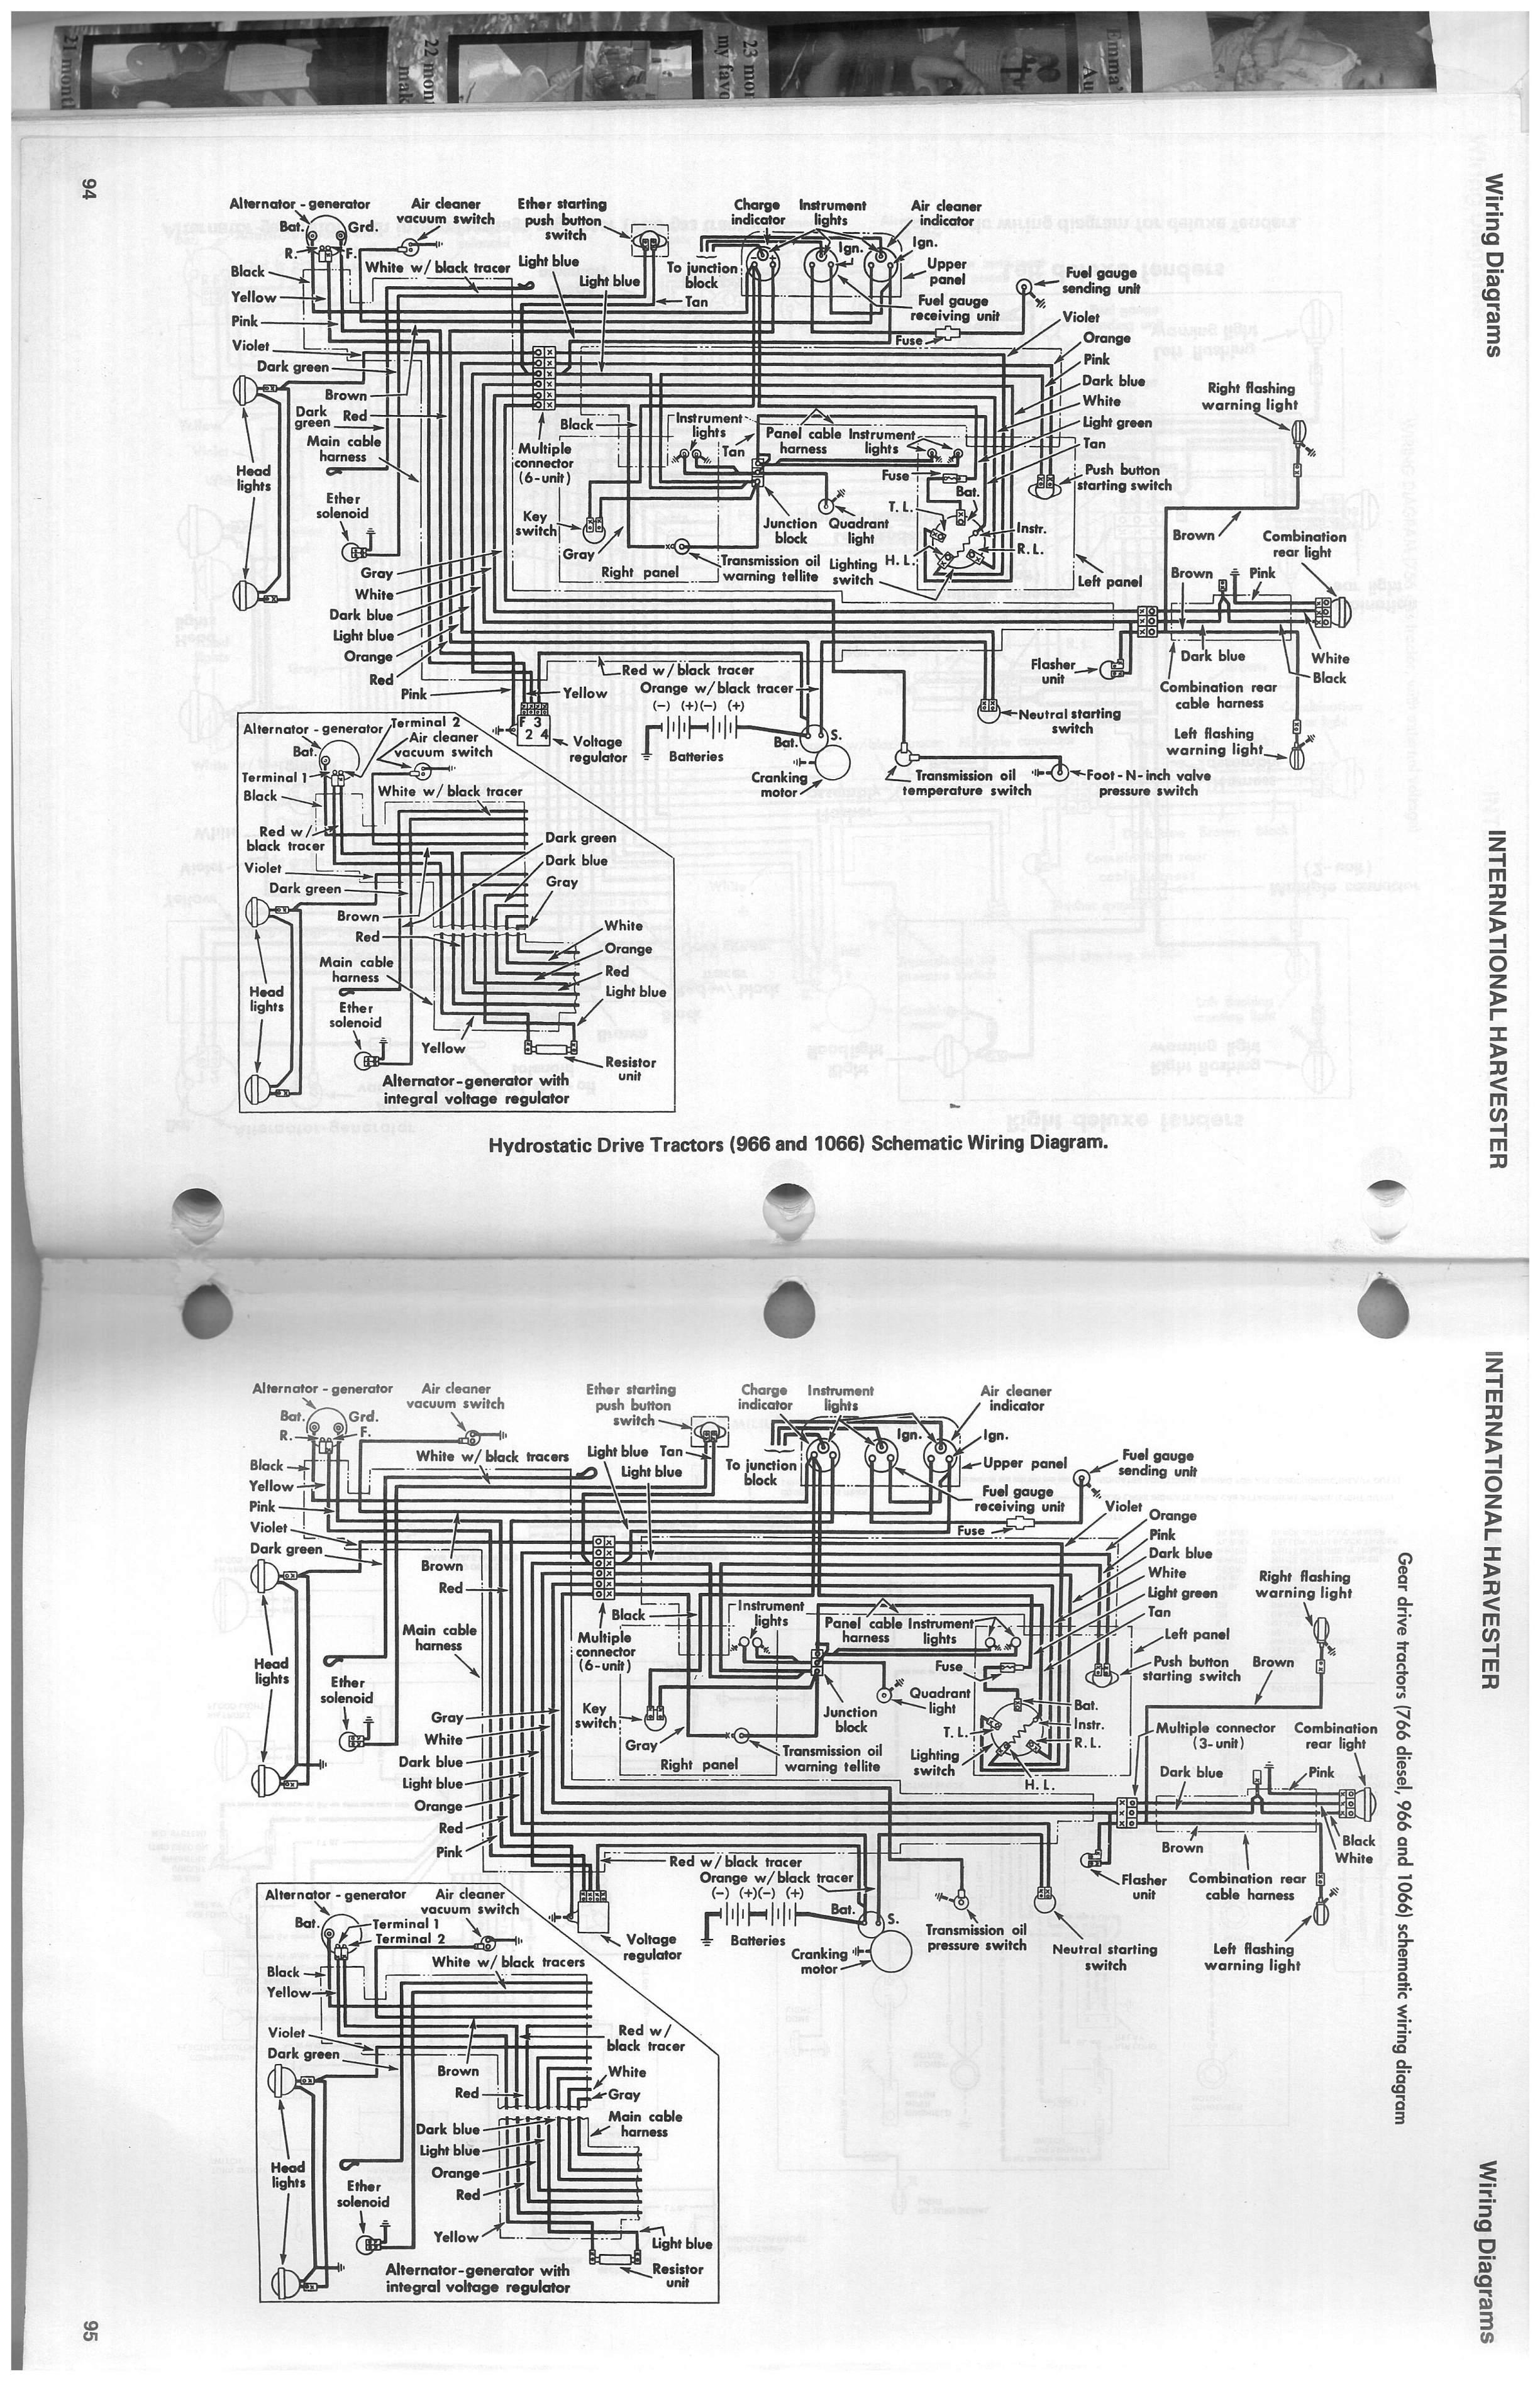 wd_5002] 930 case tractor wiring diagram free diagram  anal indi rmine bdel norab numap mohammedshrine librar wiring 101